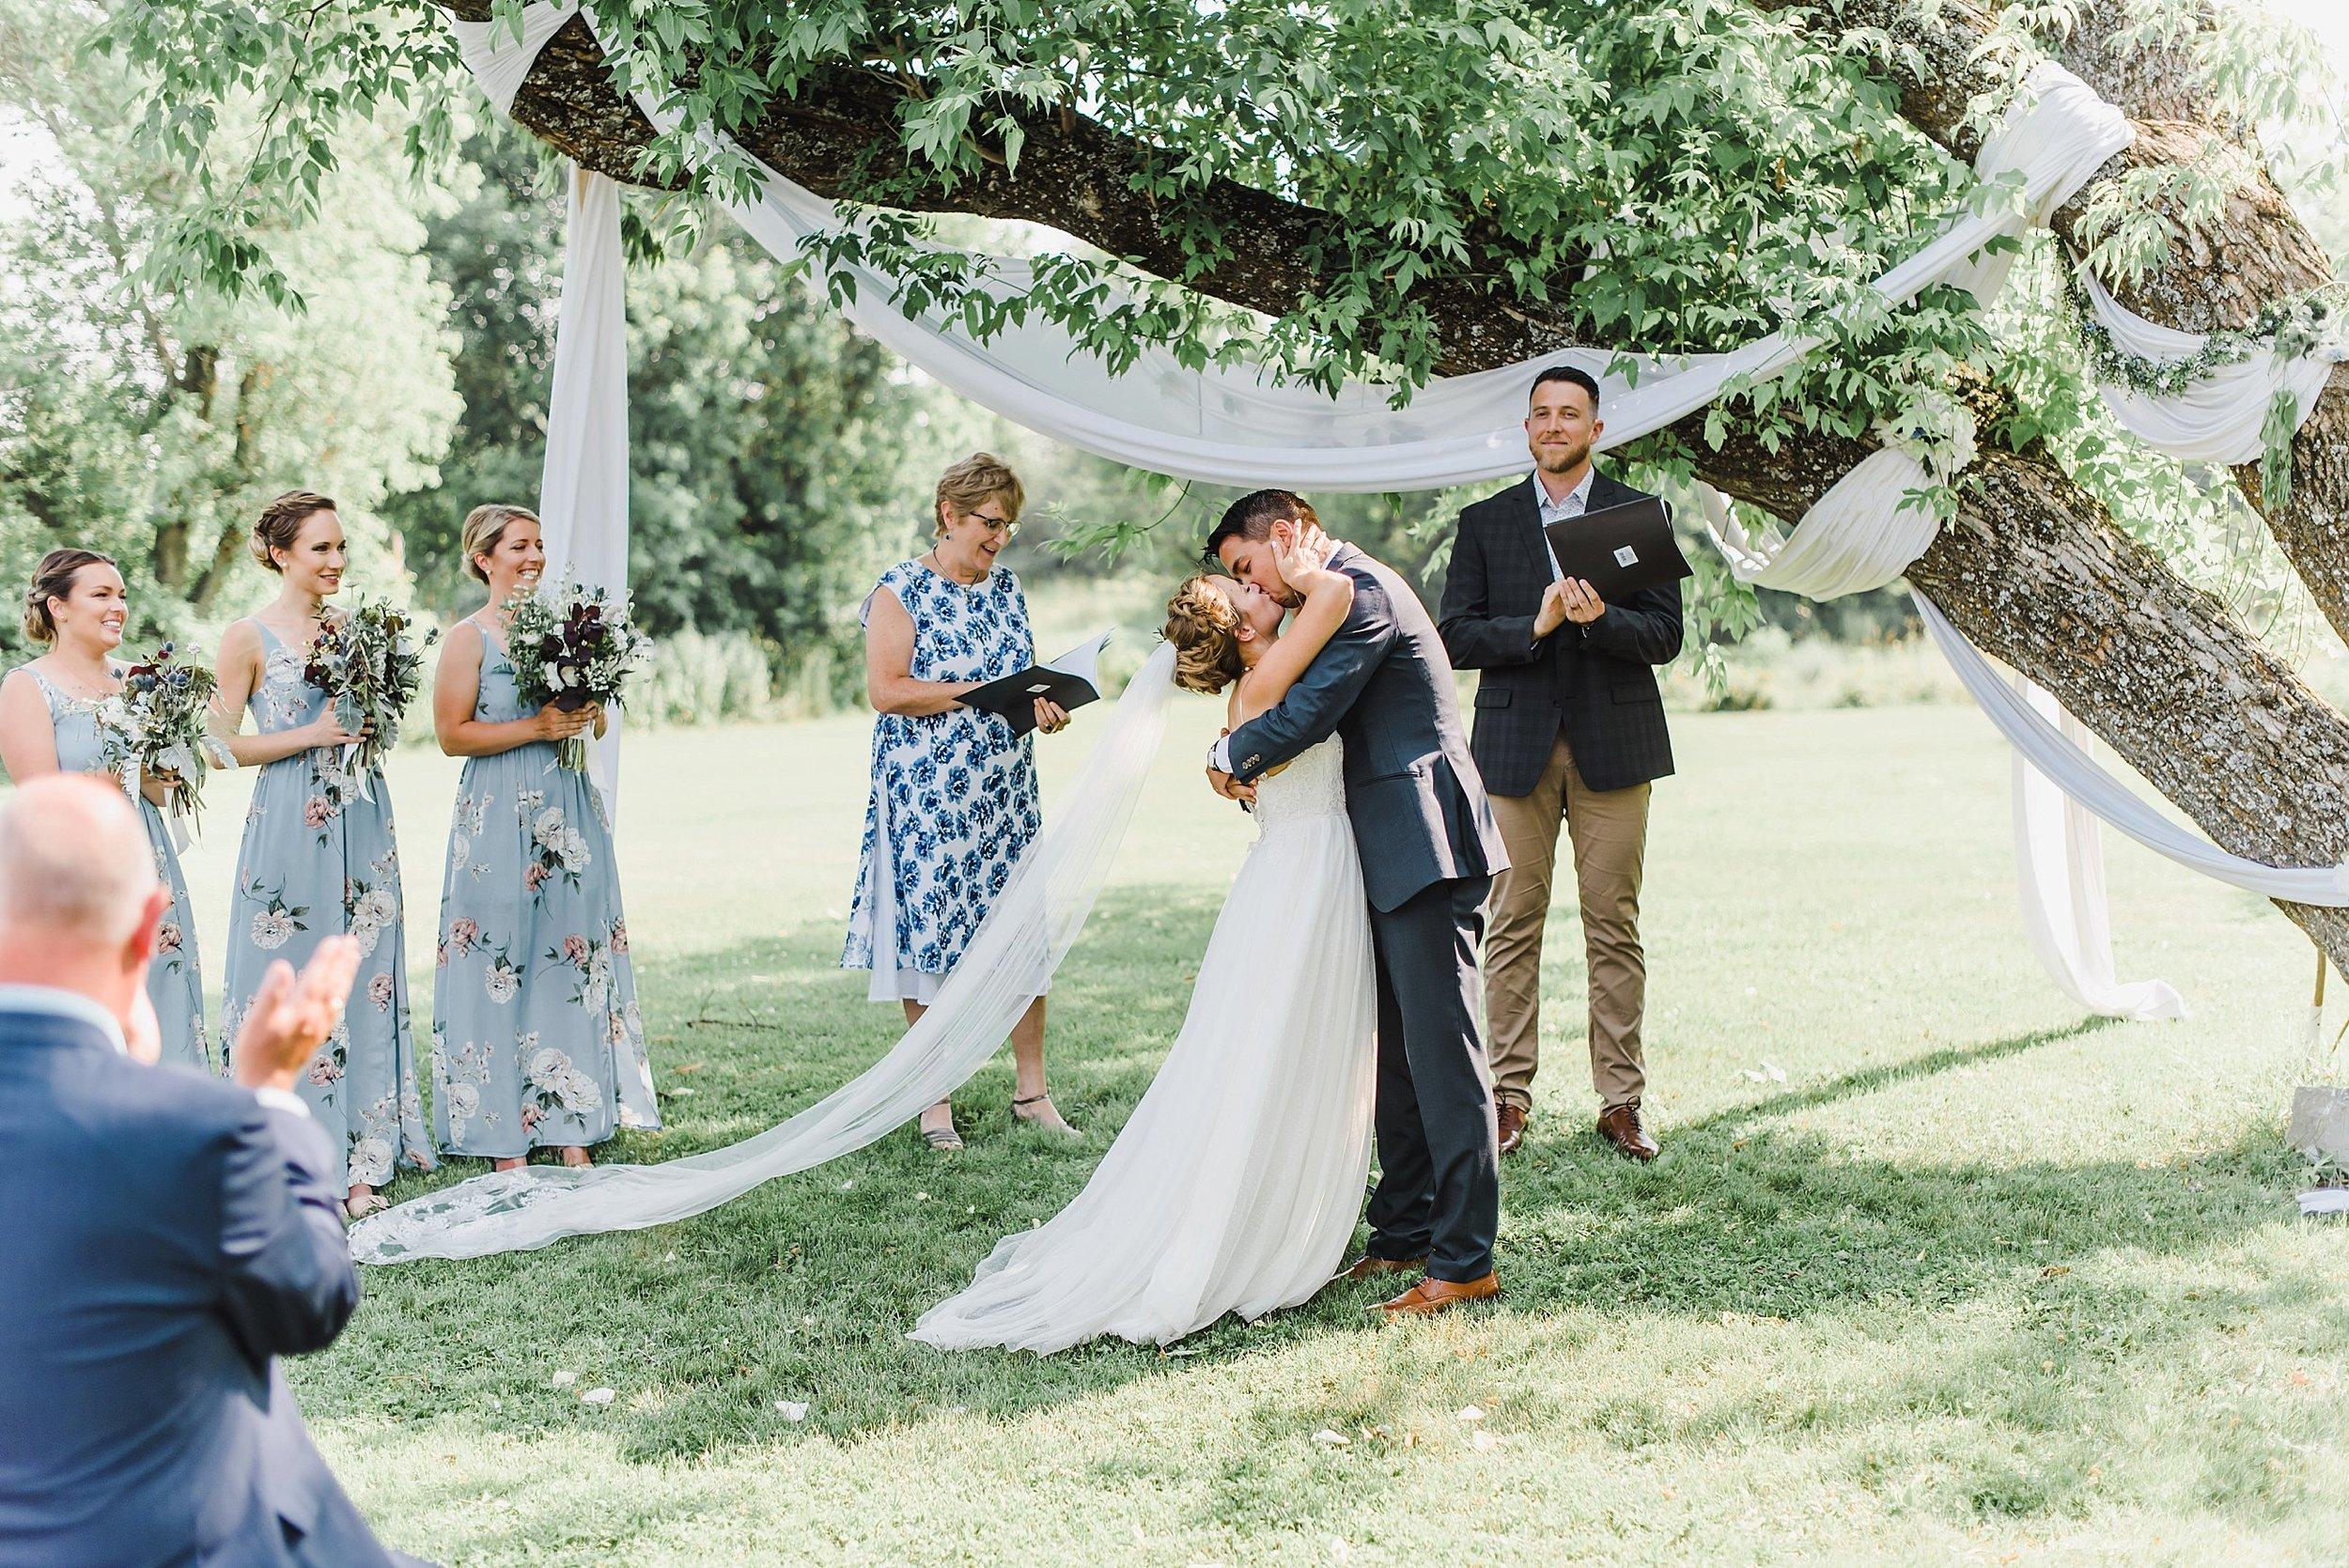 light airy indie fine art ottawa wedding photographer | Ali and Batoul Photography_0817.jpg